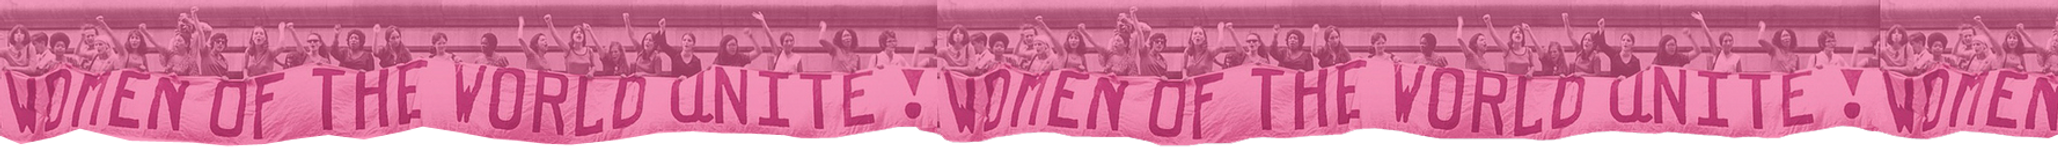 ROW WOMEN Unite - Copy.png